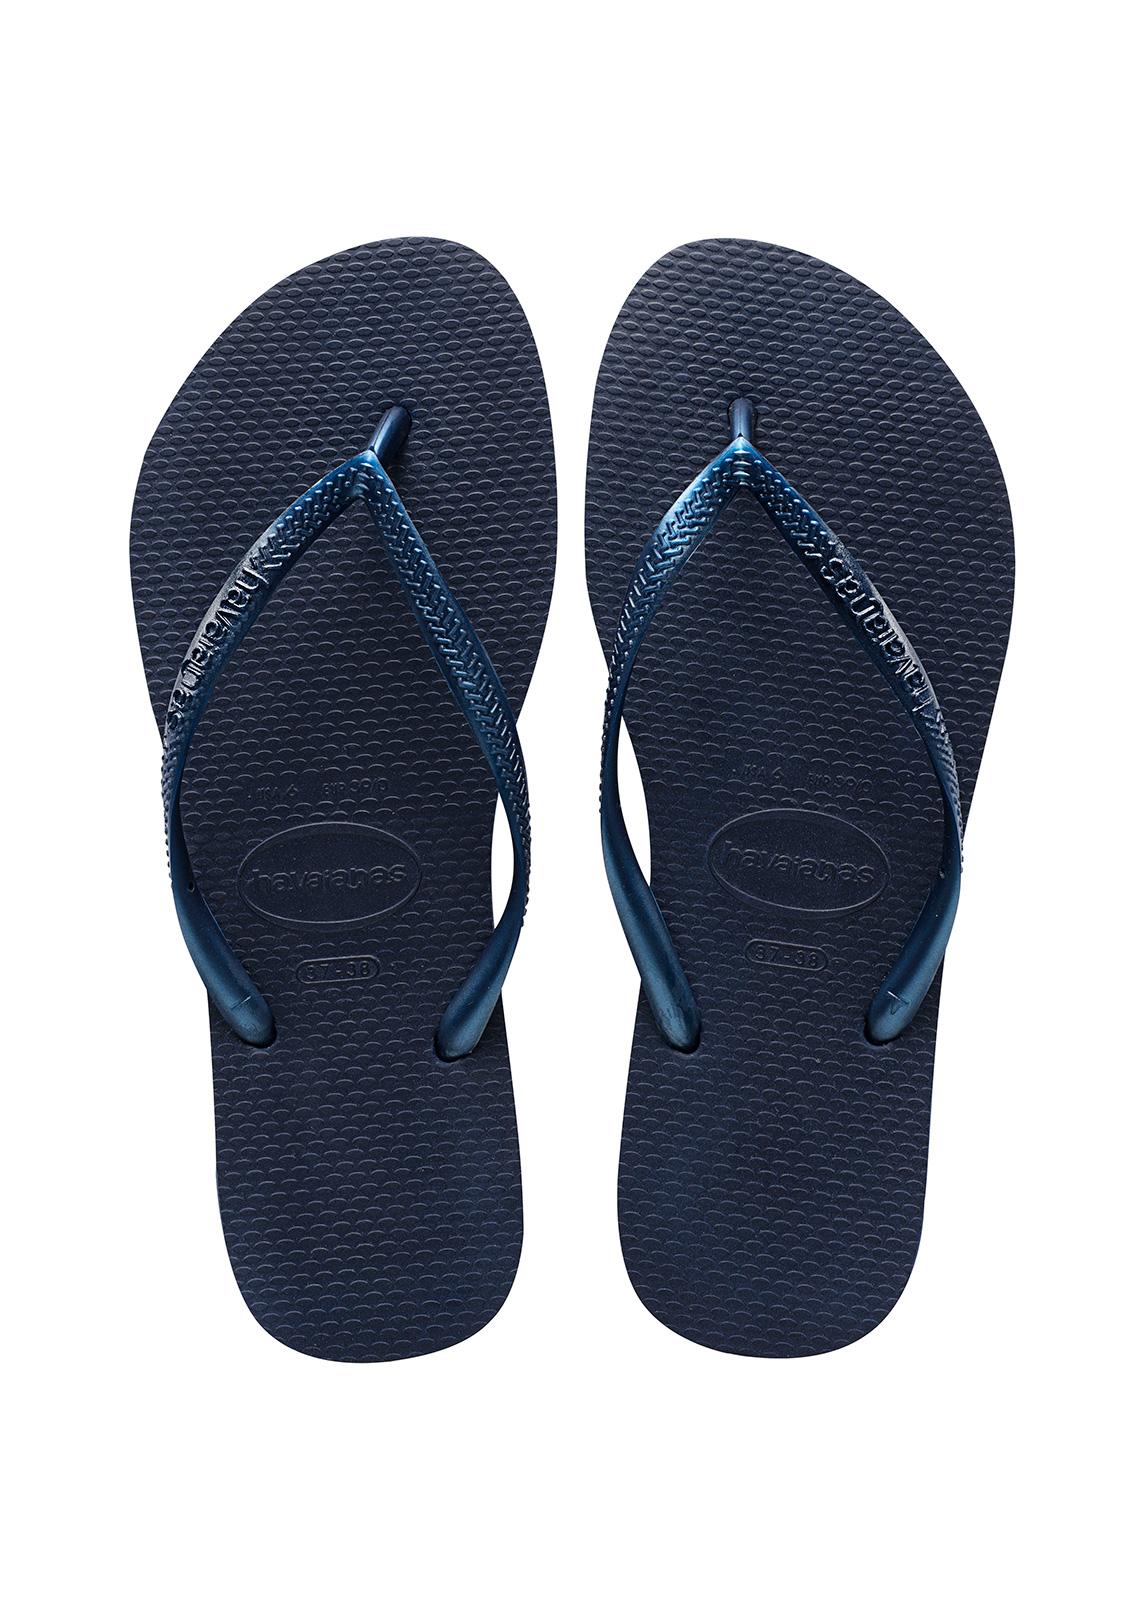 A buon mercatoHAVAIANAS SLIM Navy Blue sulla vendita